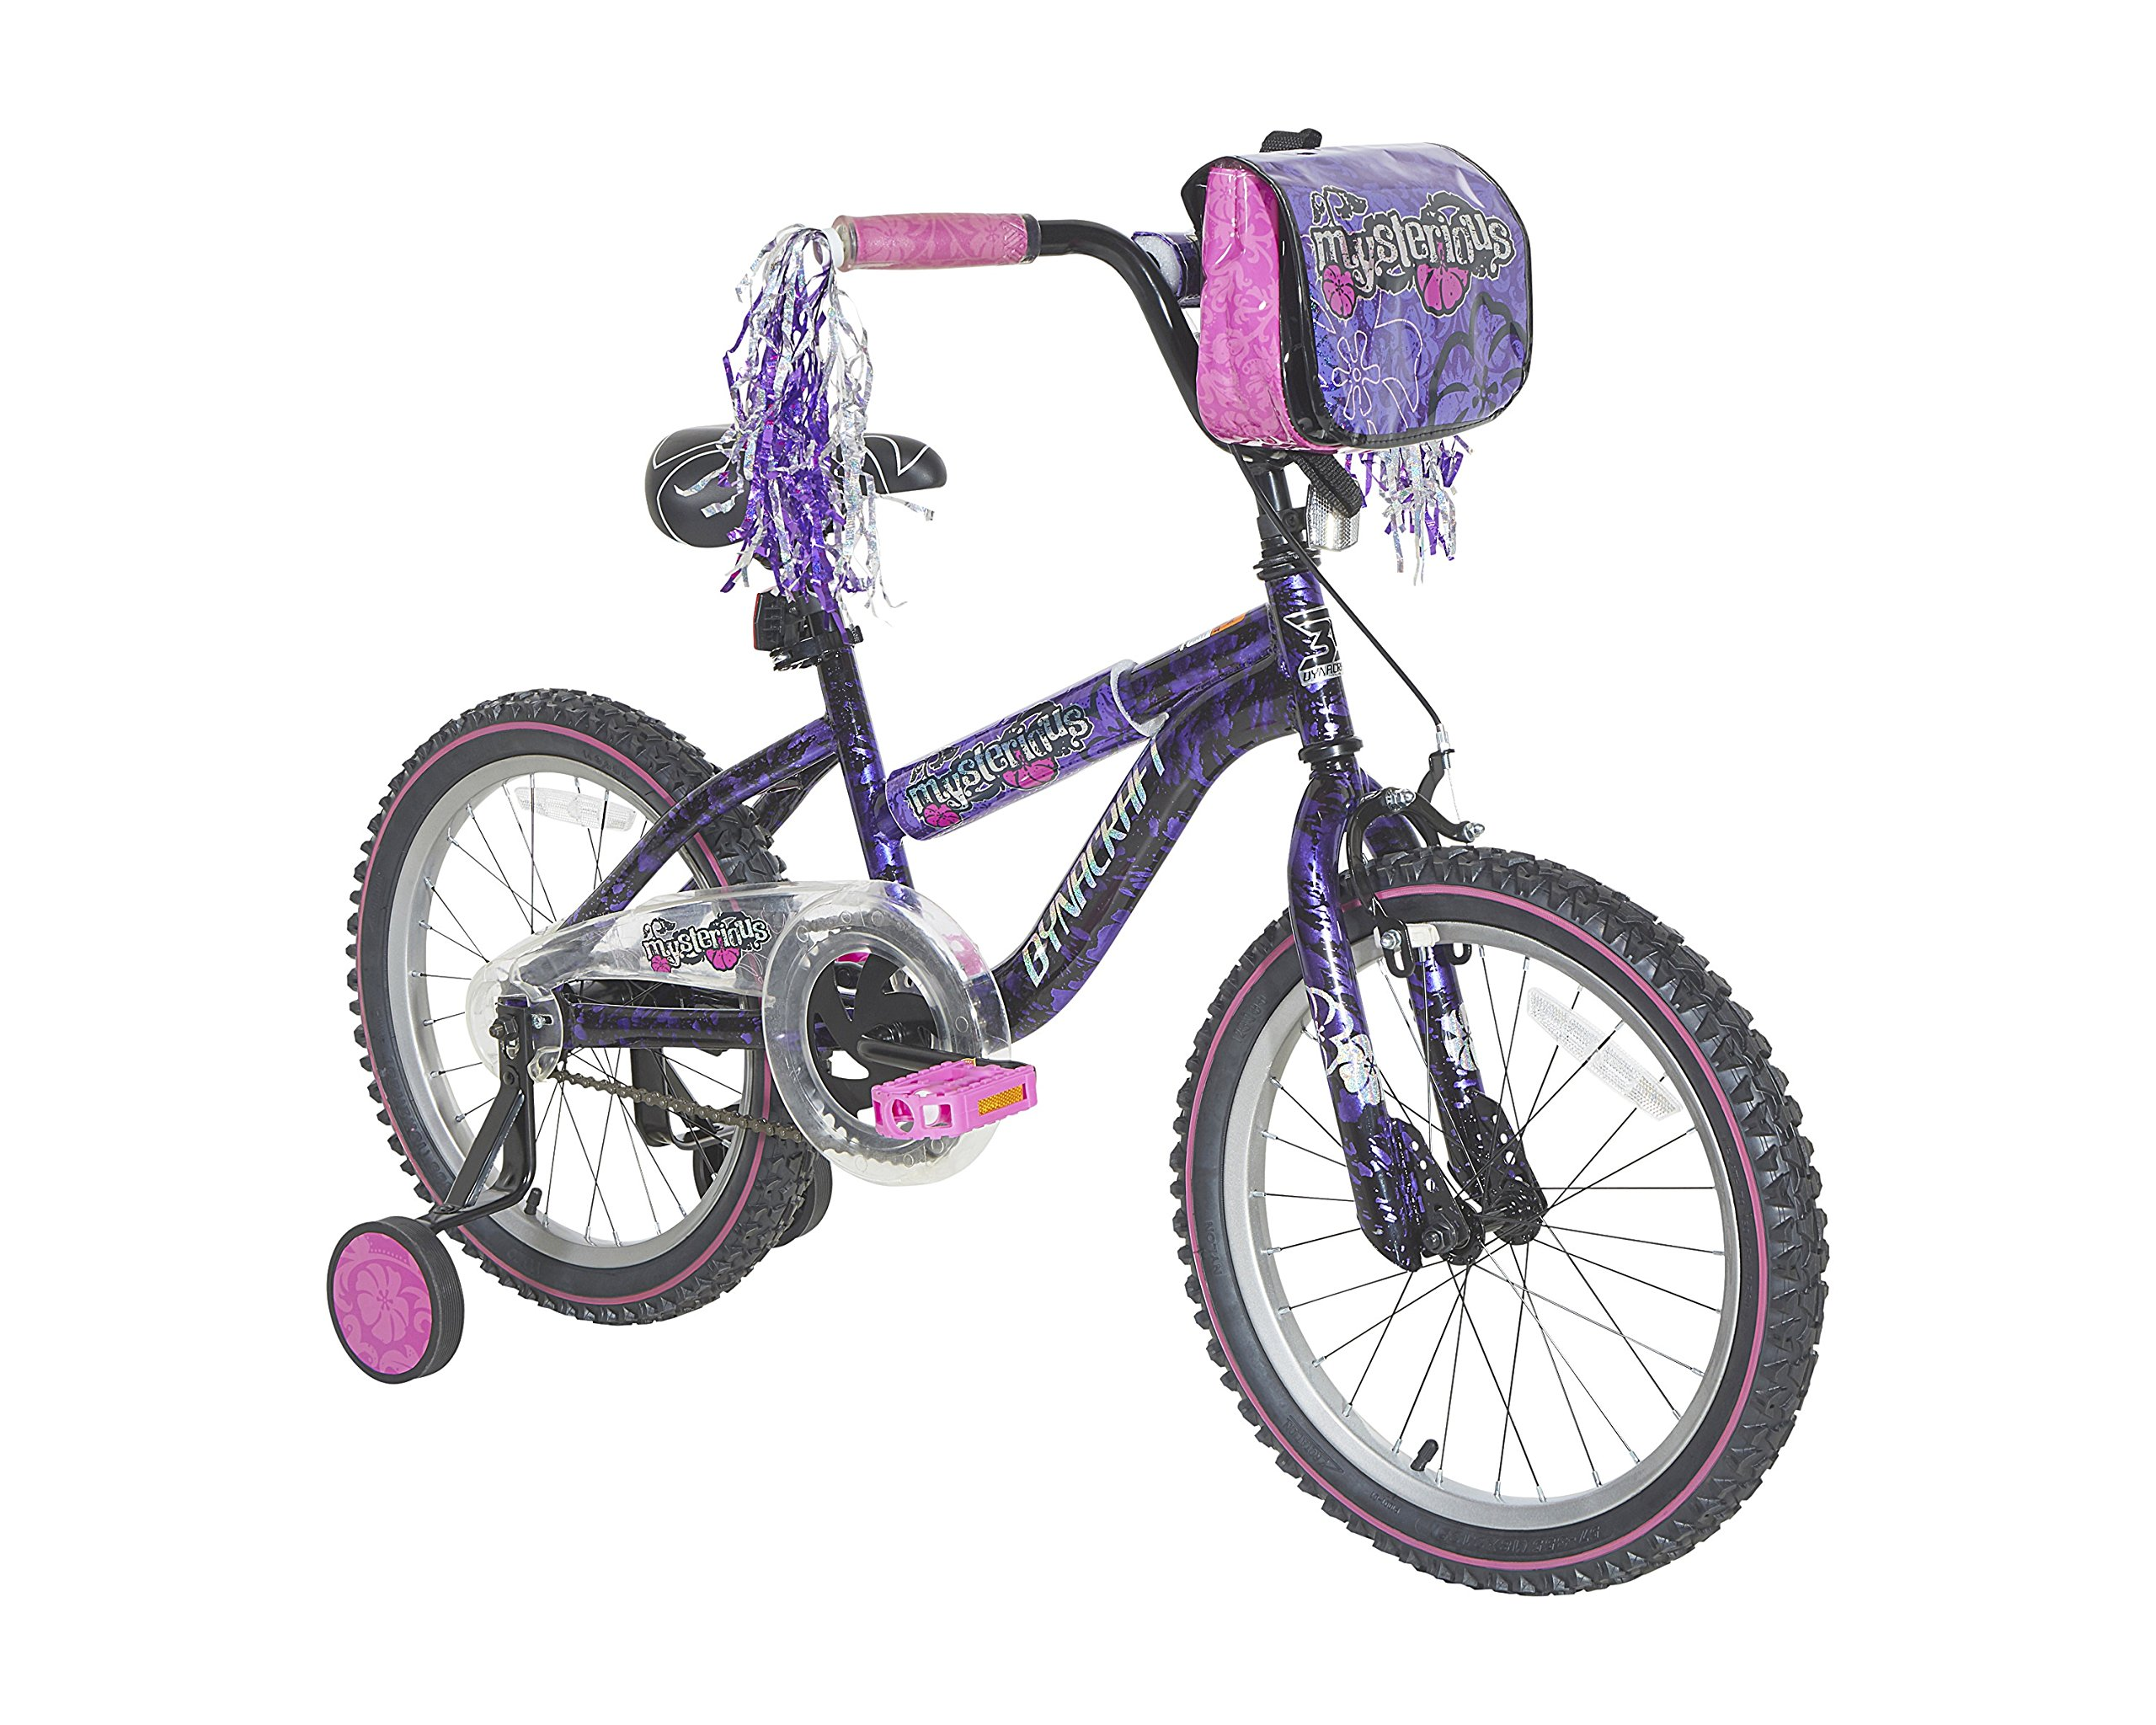 "Dynacraft Mysterious Girls BMX Street/Dirt Bike With Hand Brake 18"", Purple/Black/Pink"